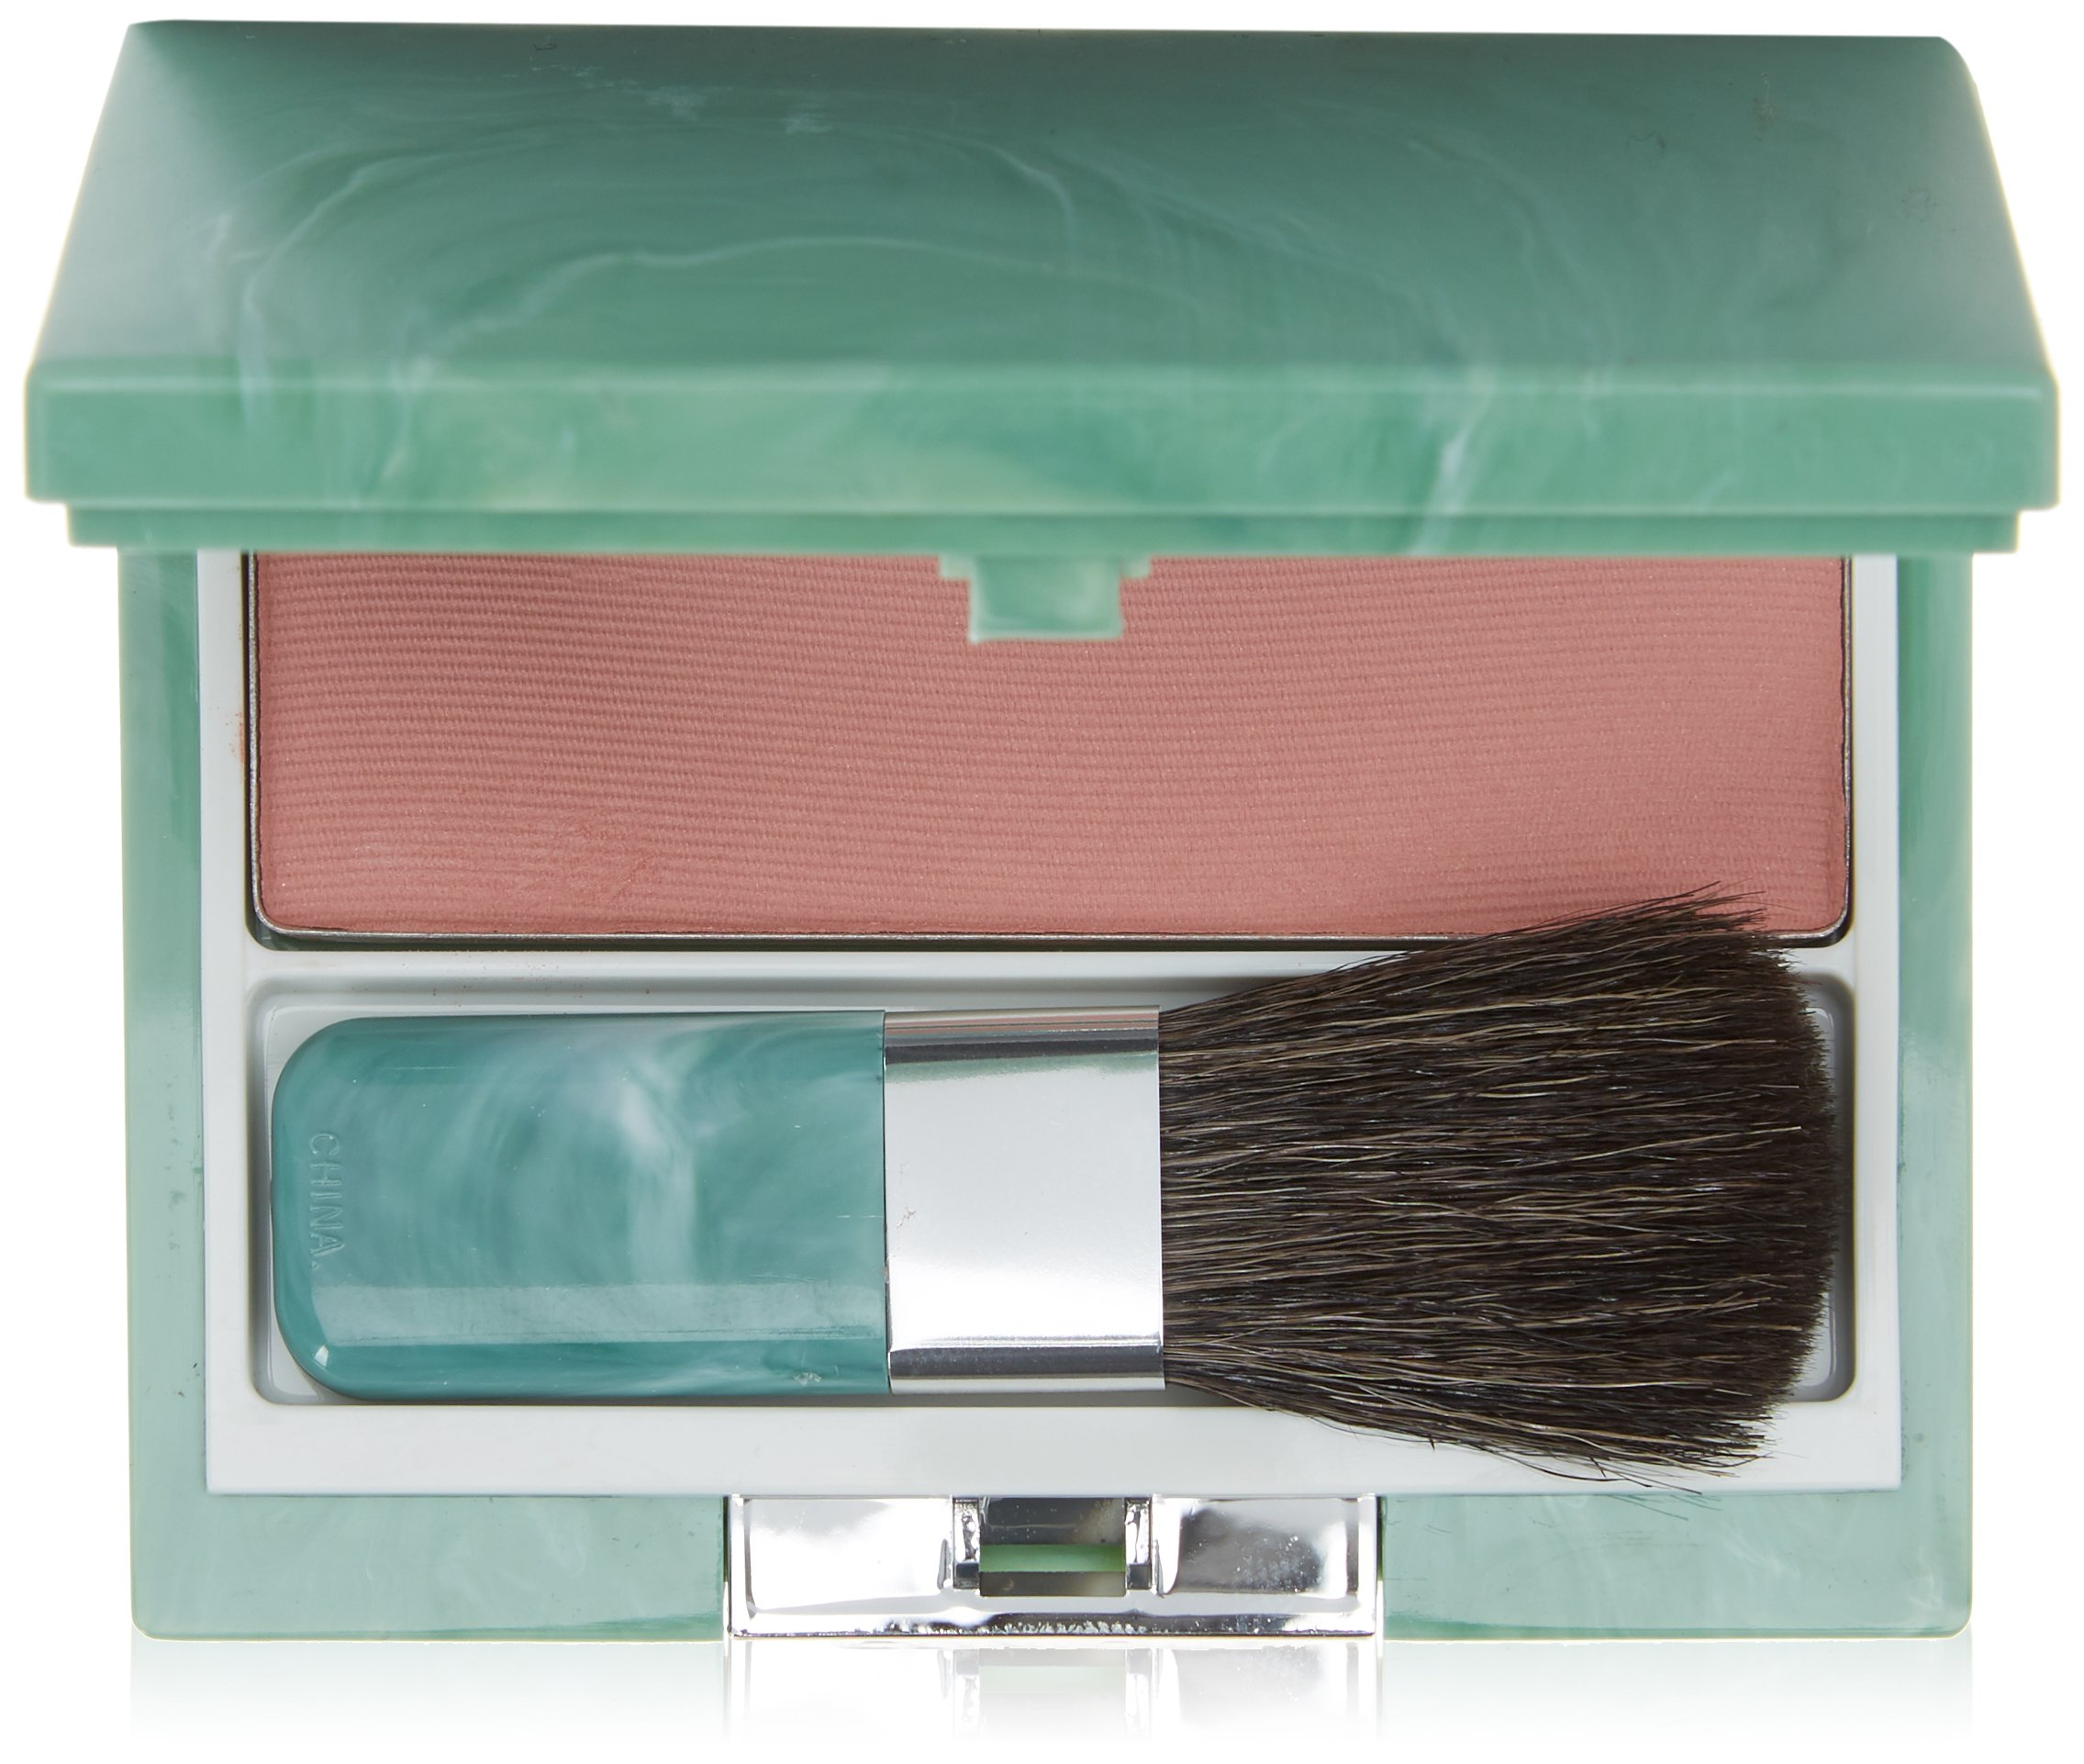 Clinique Soft Pressed Powder Blusher 01 New Clover